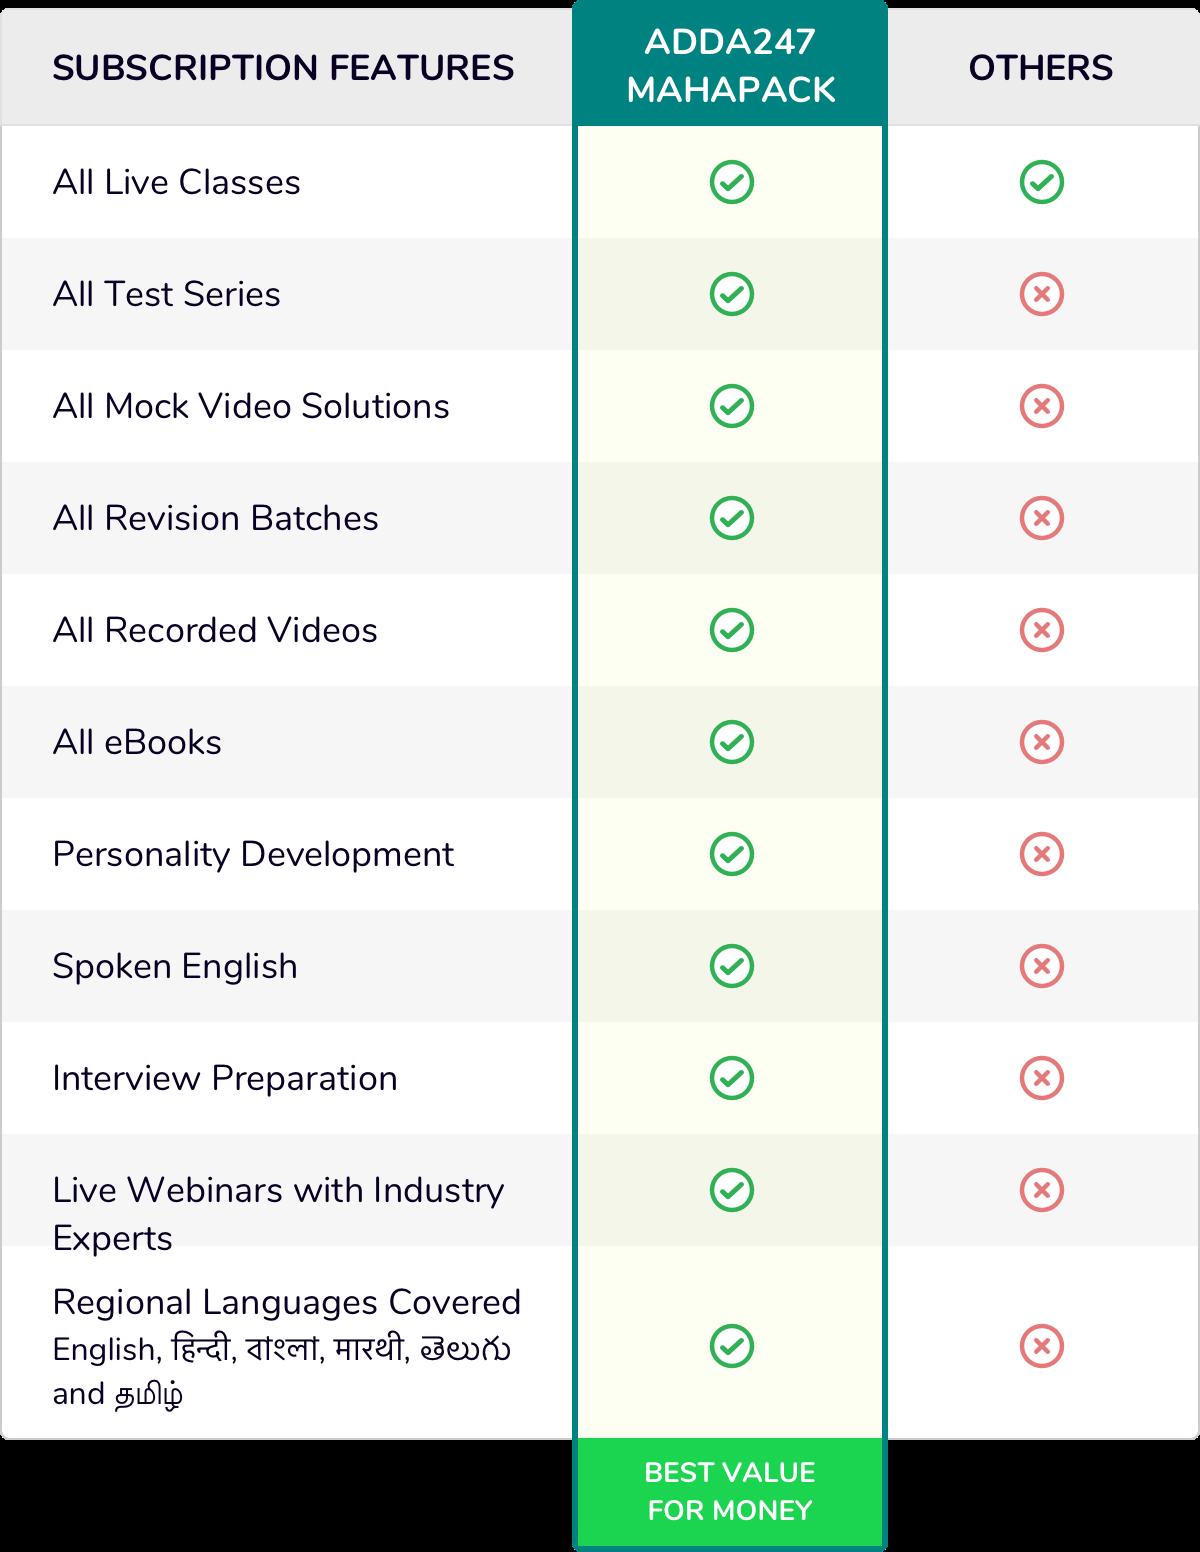 features of adda247 Mahapack